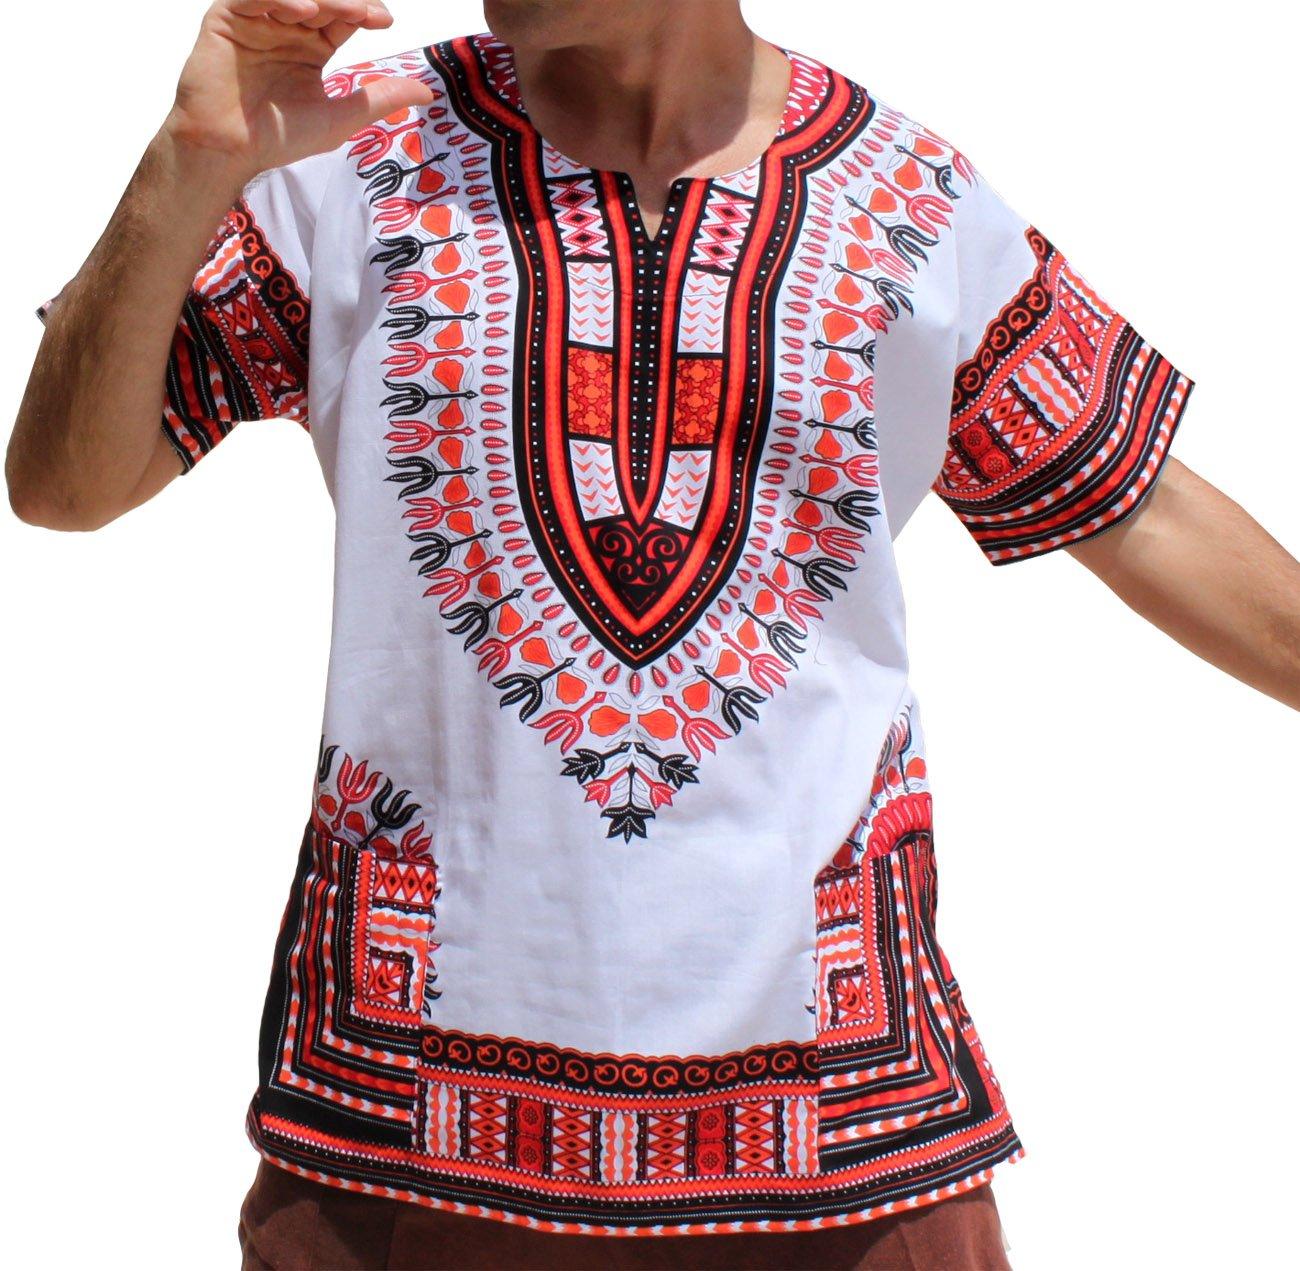 RaanPahMuang Brand Unisex Bright African White Dashiki Cotton Shirt variant16550AMZ